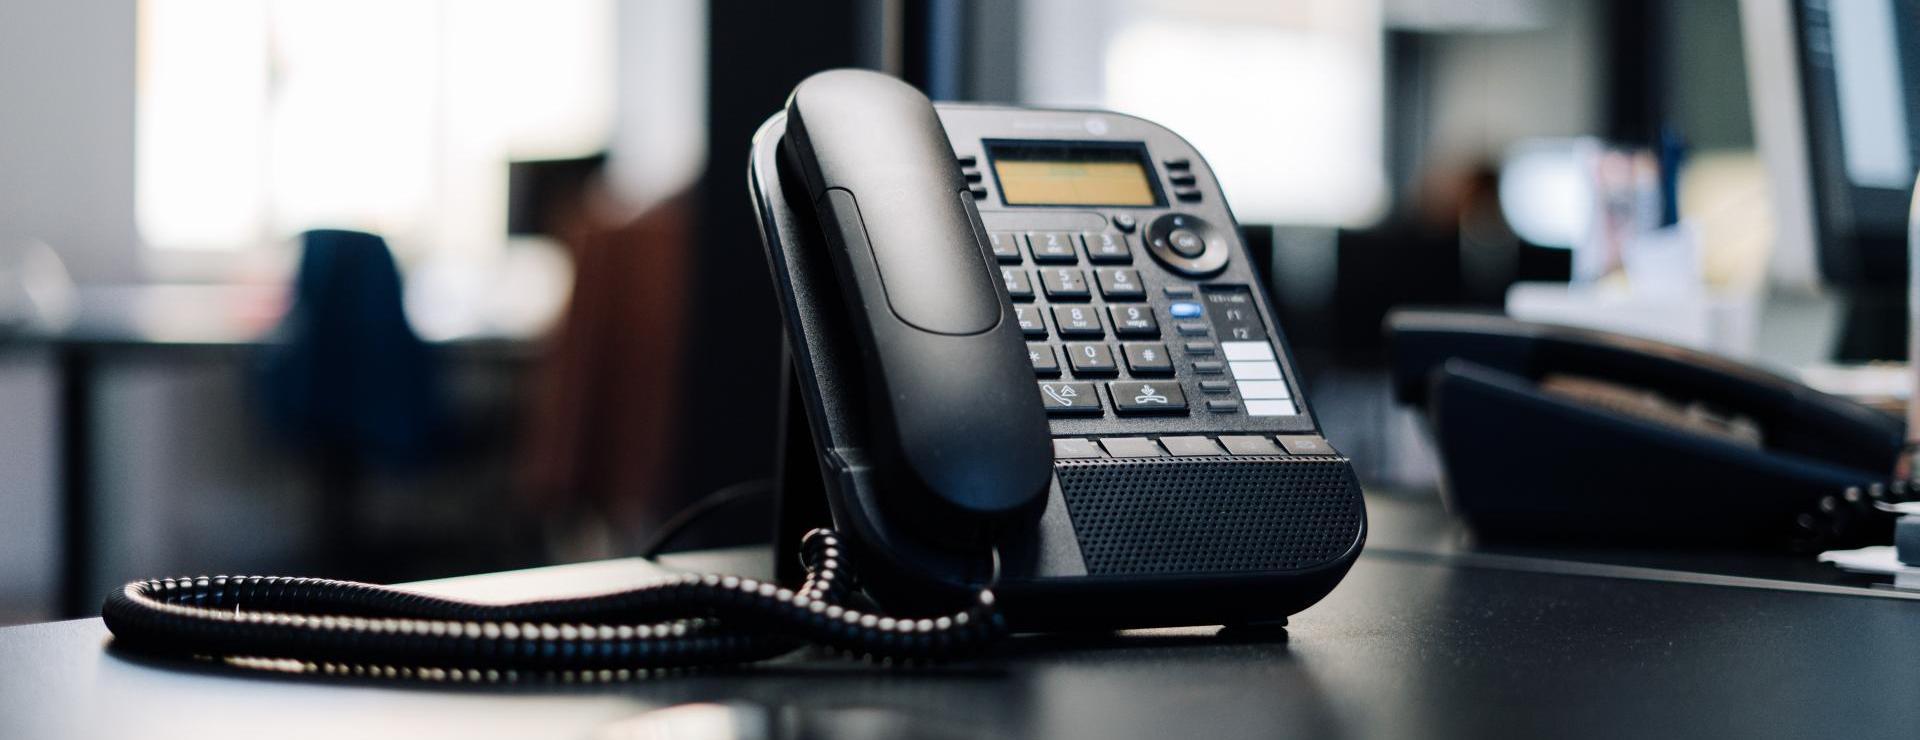 Black multiline phone on desk near window